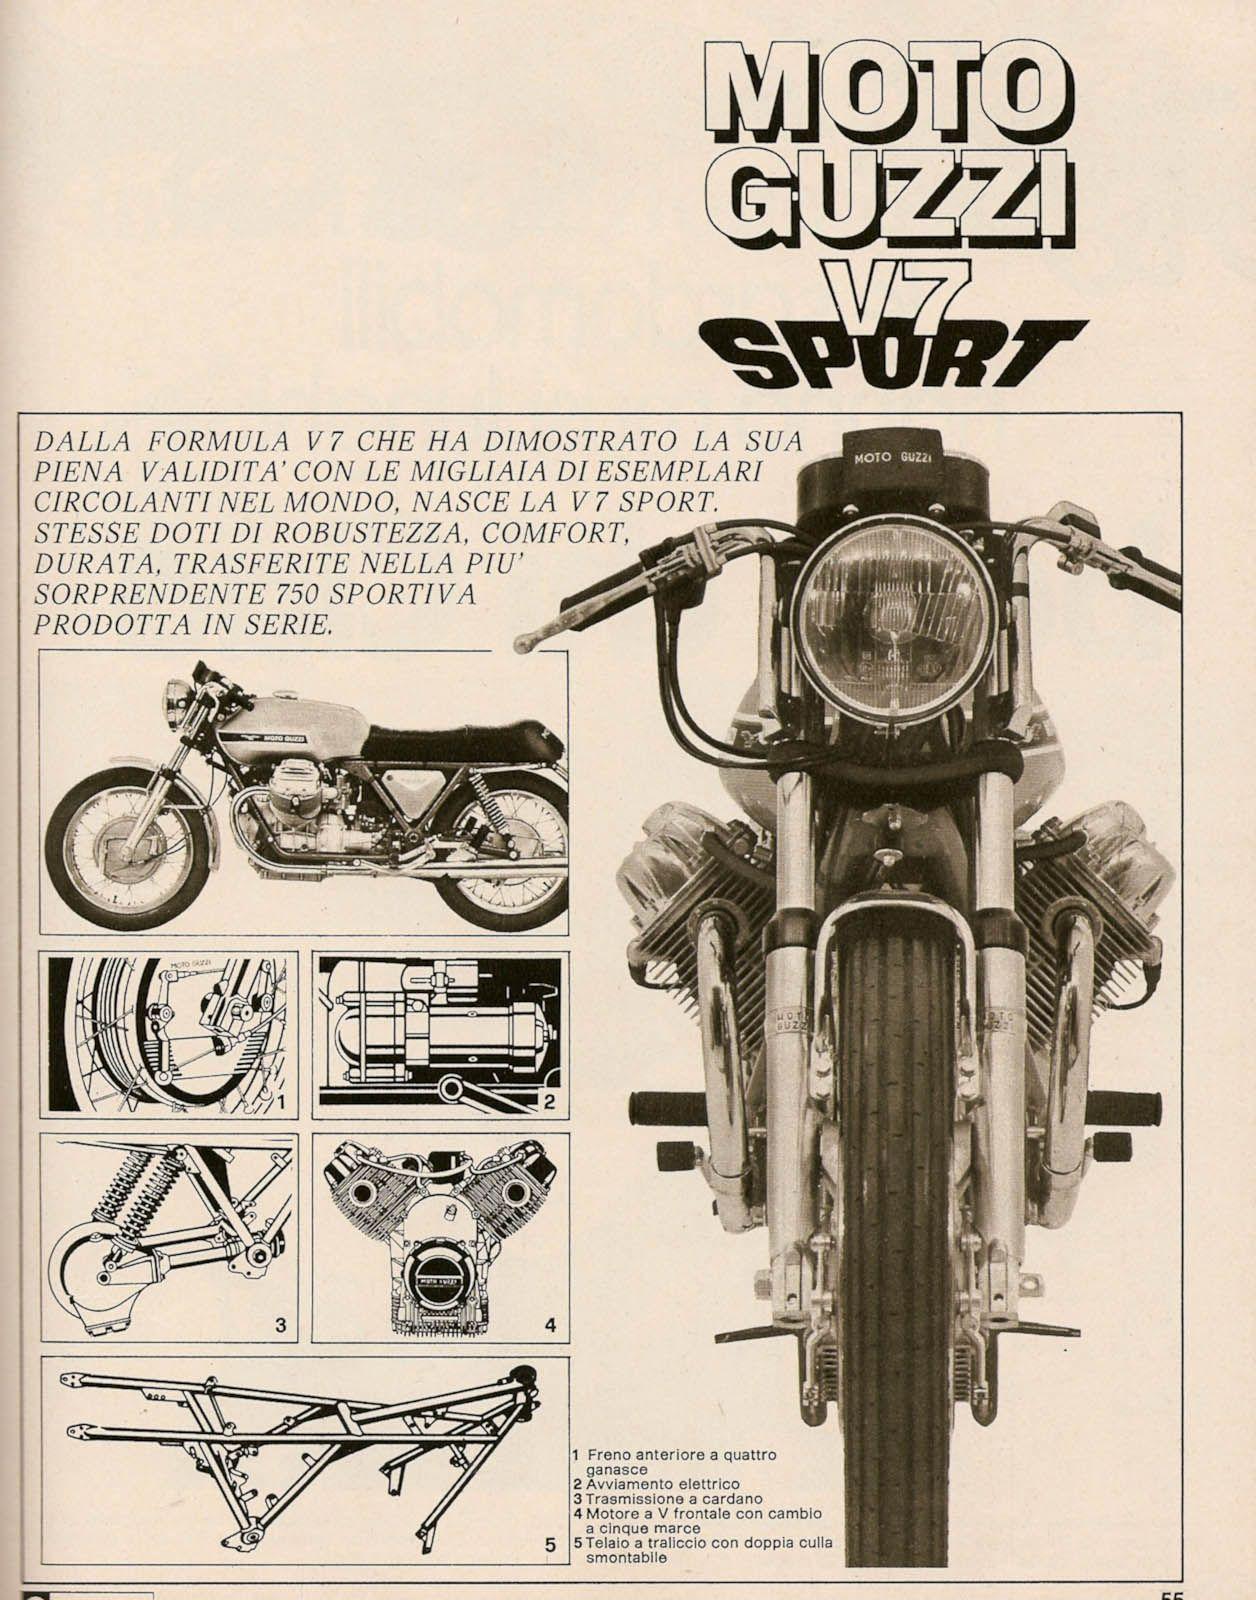 Moto Guzzi V7 Sport - such a beautiful bike, then and now. Always ...